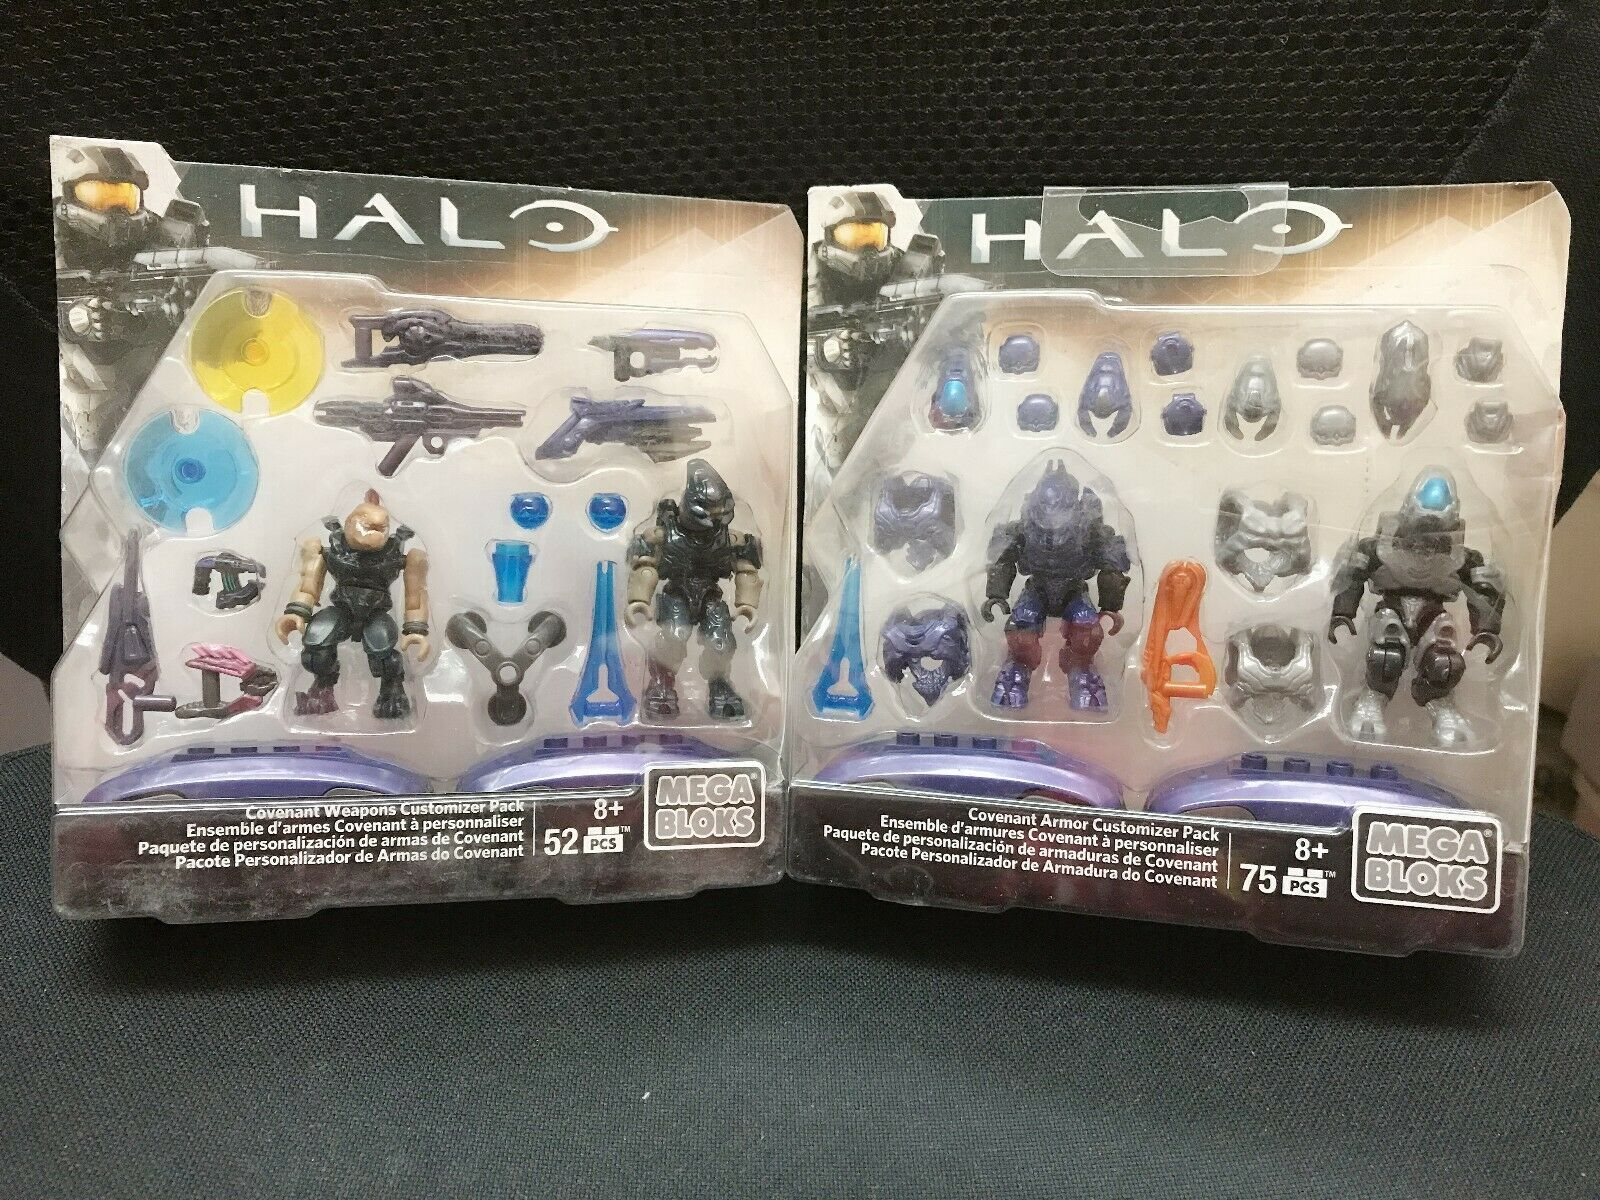 Mega Bloks Halo Covenant Armor Customizer Pack #38190